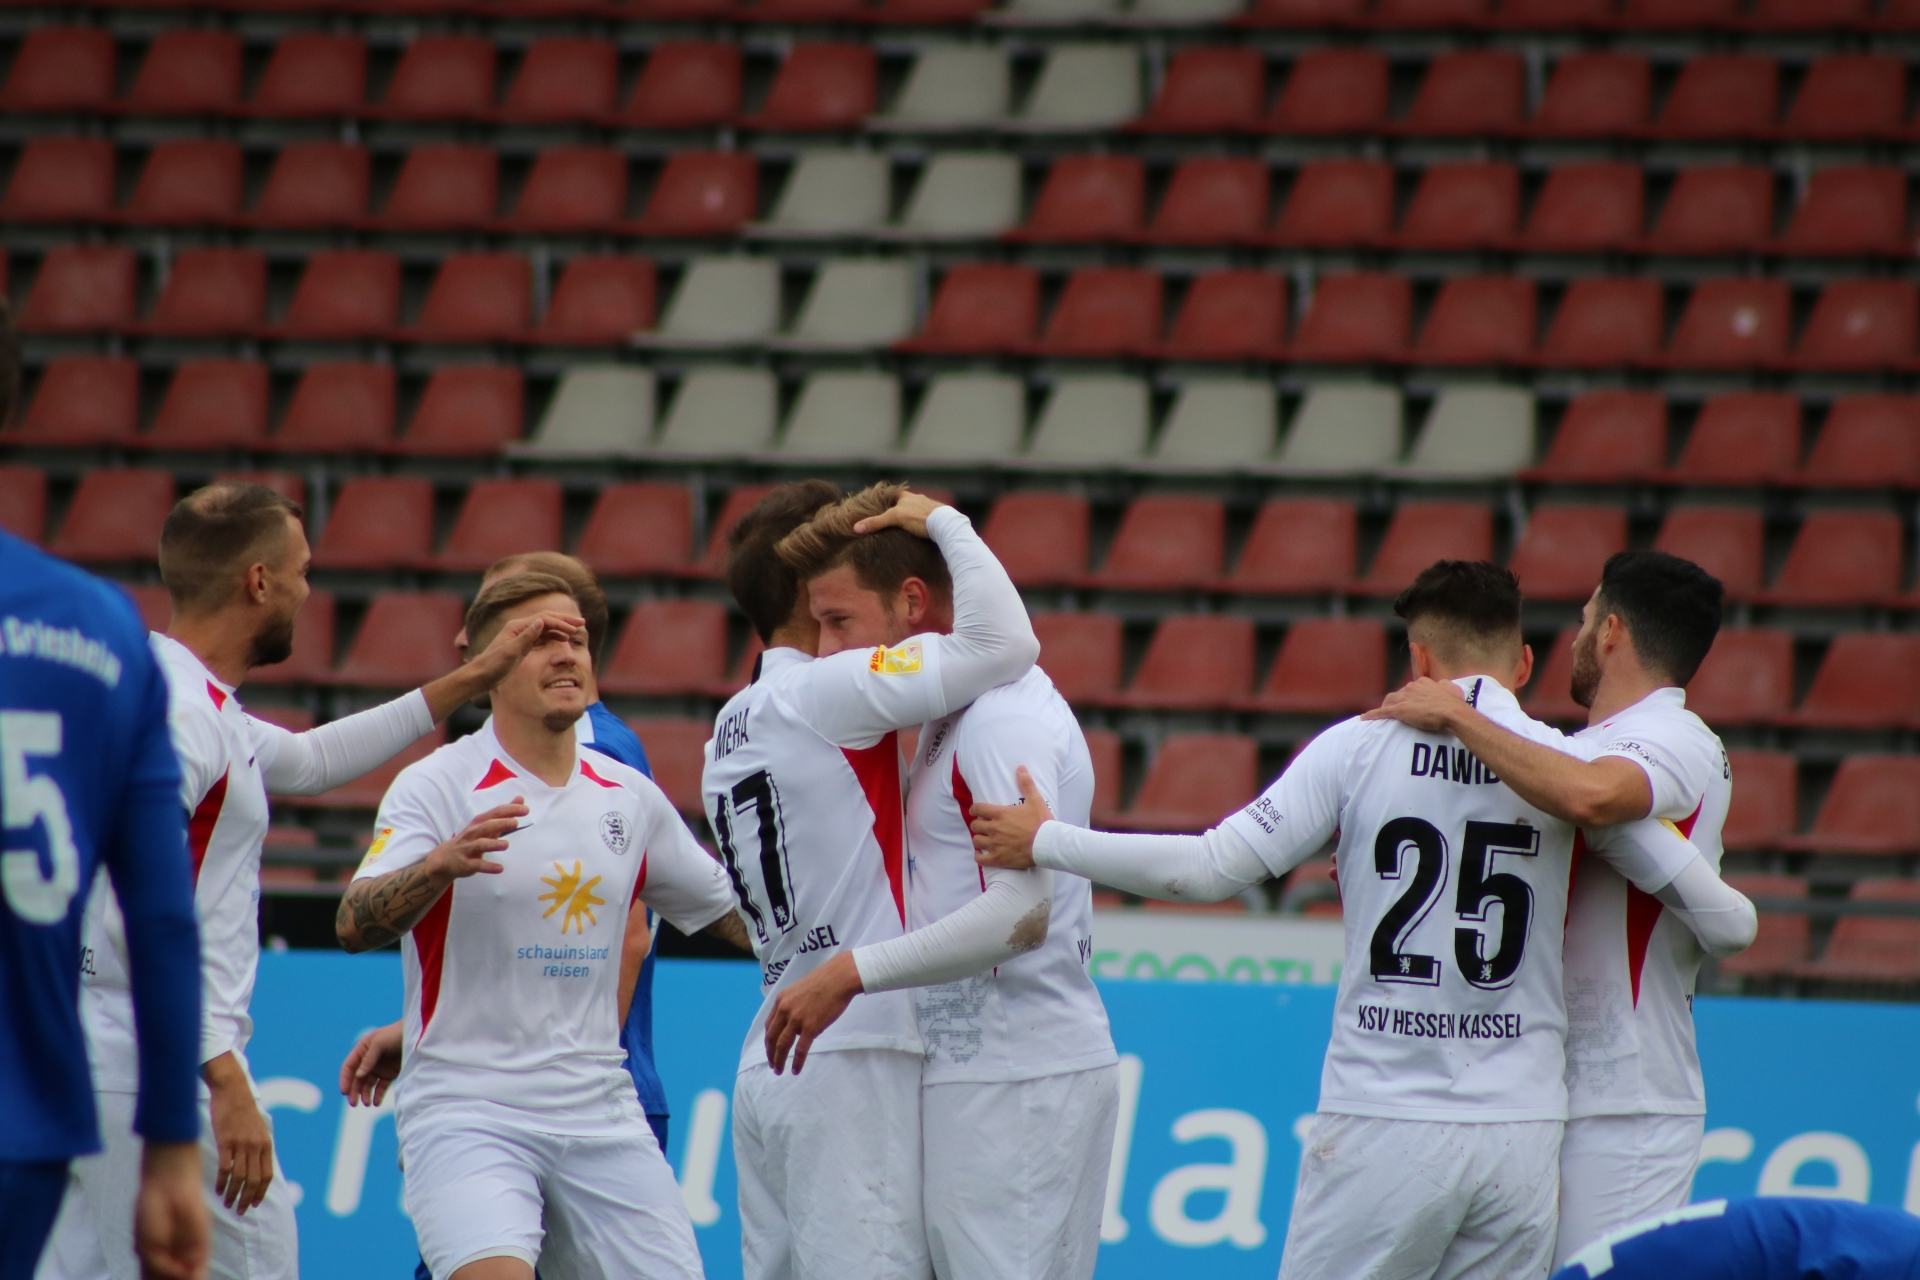 KSV Hessen Kassel - Viktoria Griesheim